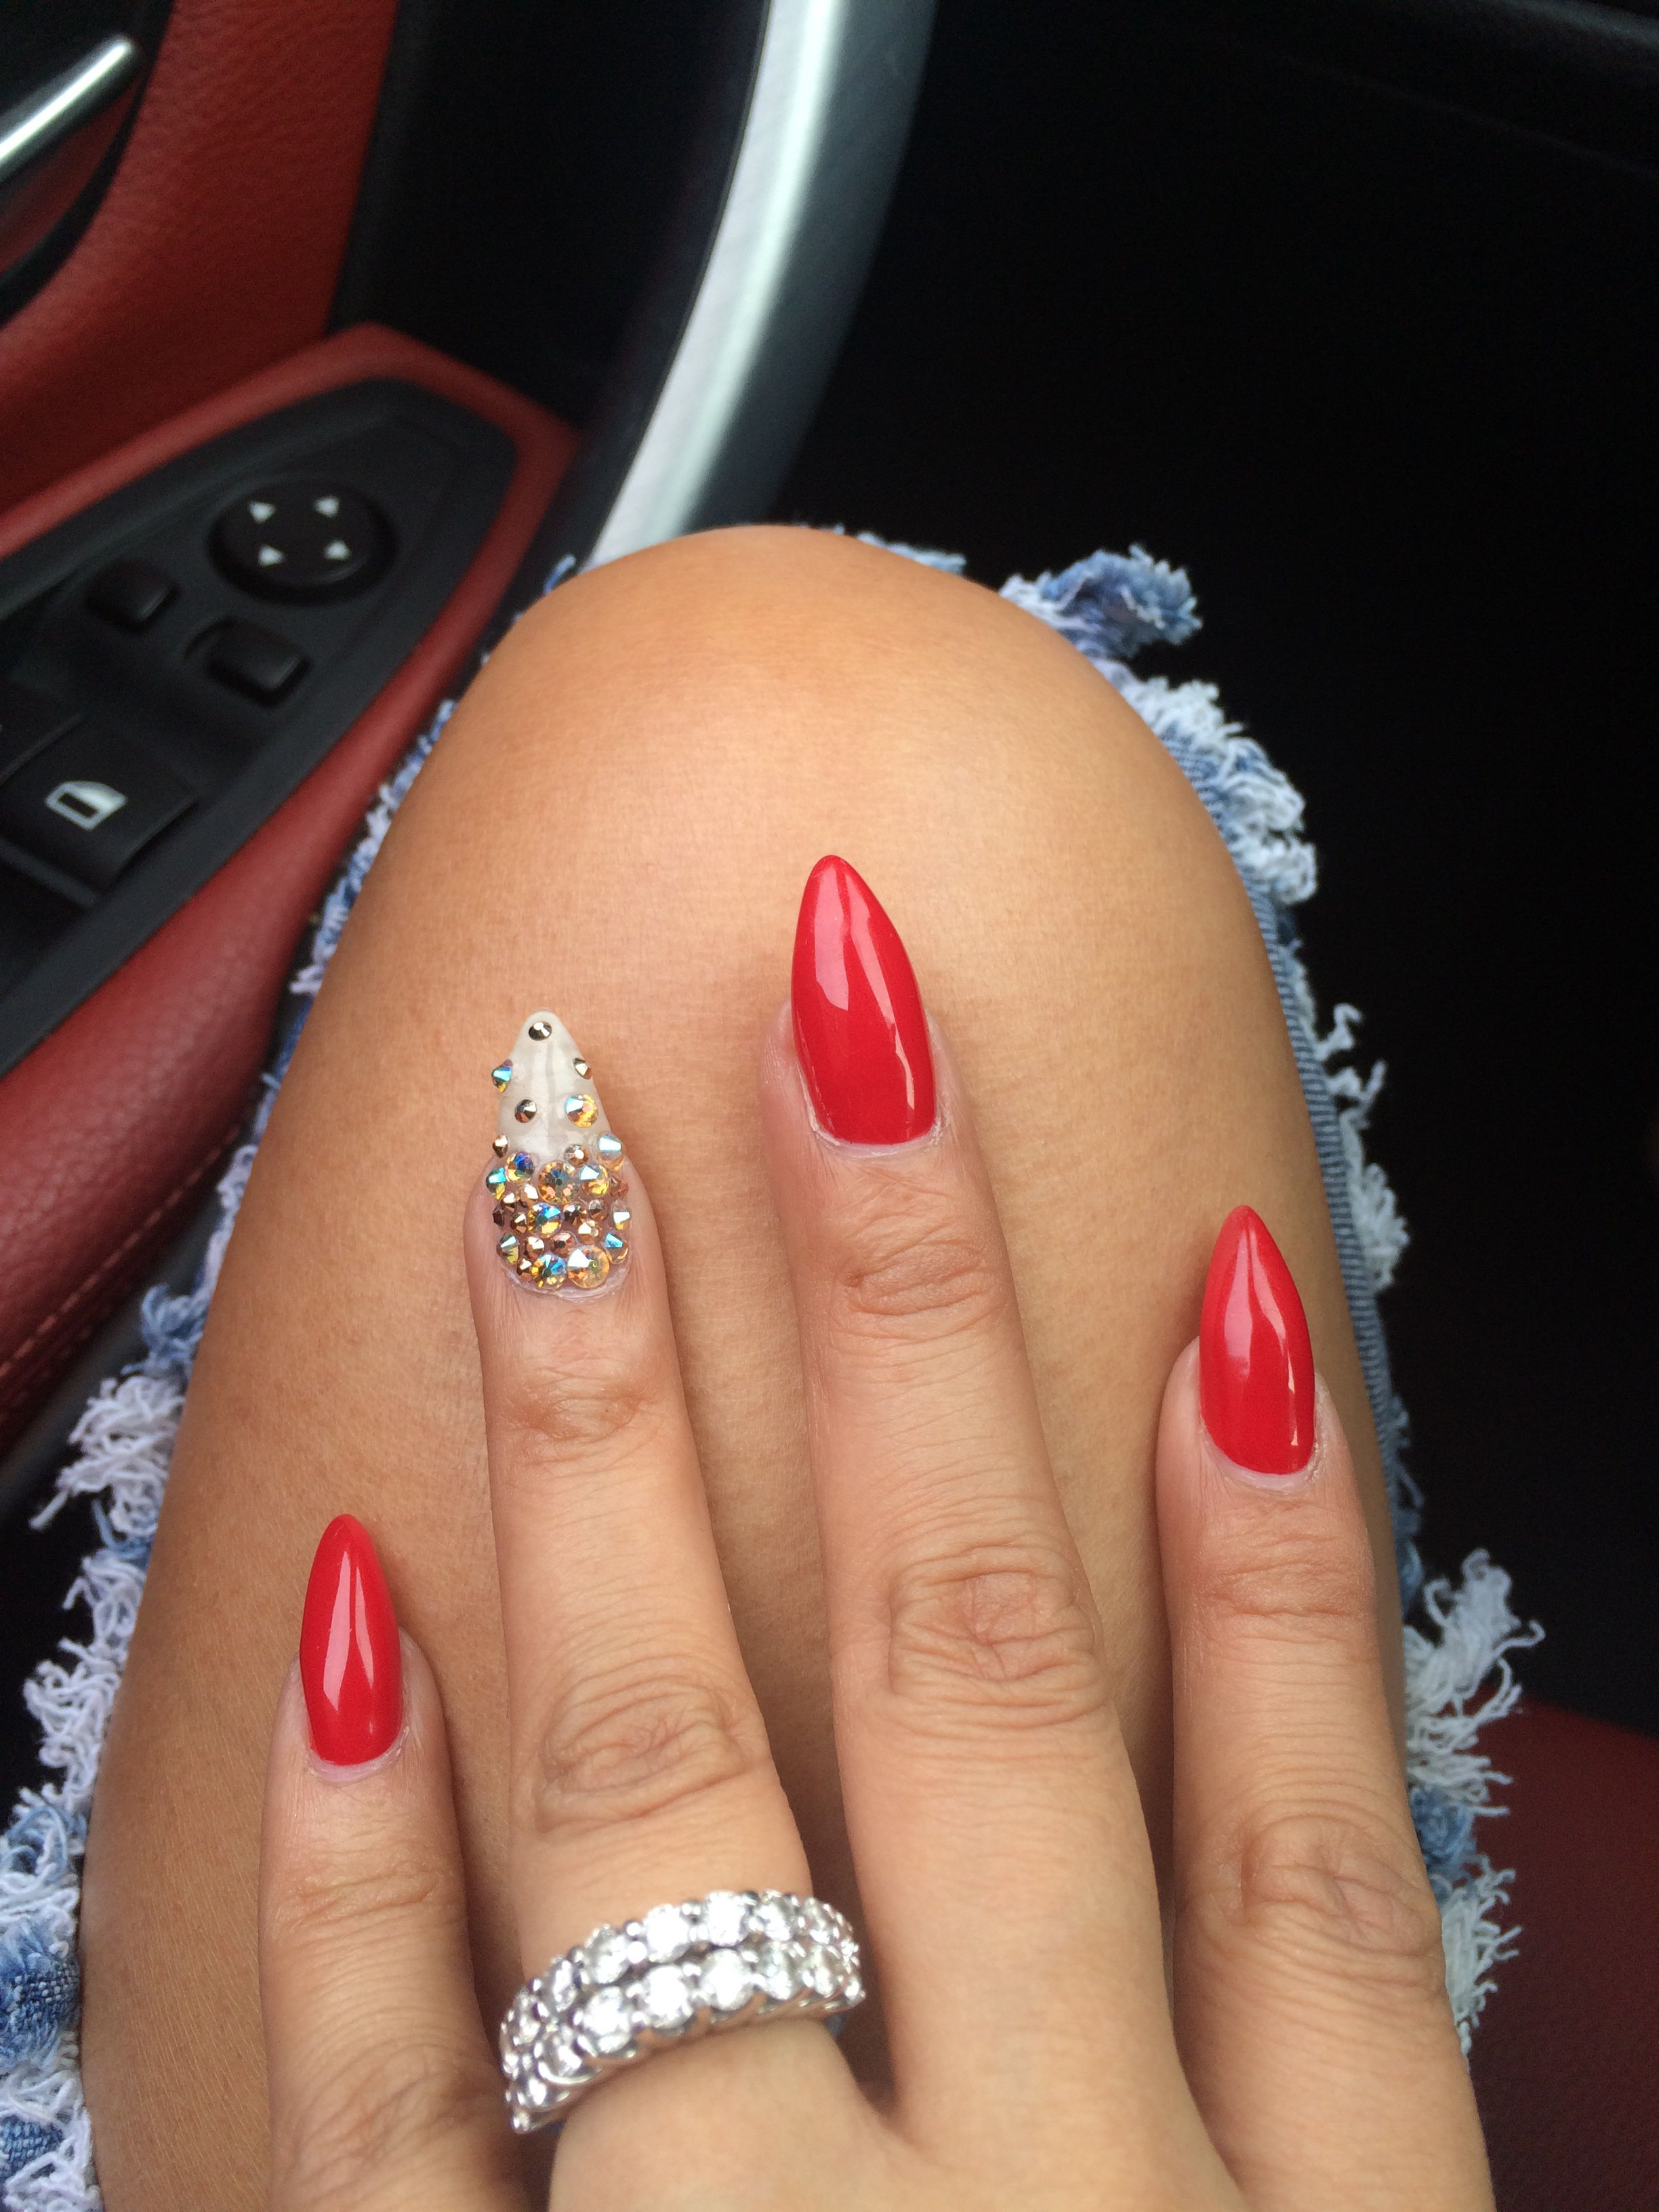 My Red stiletto nails @GLO_NJF | Nail Art | Pinterest | Red stiletto ...